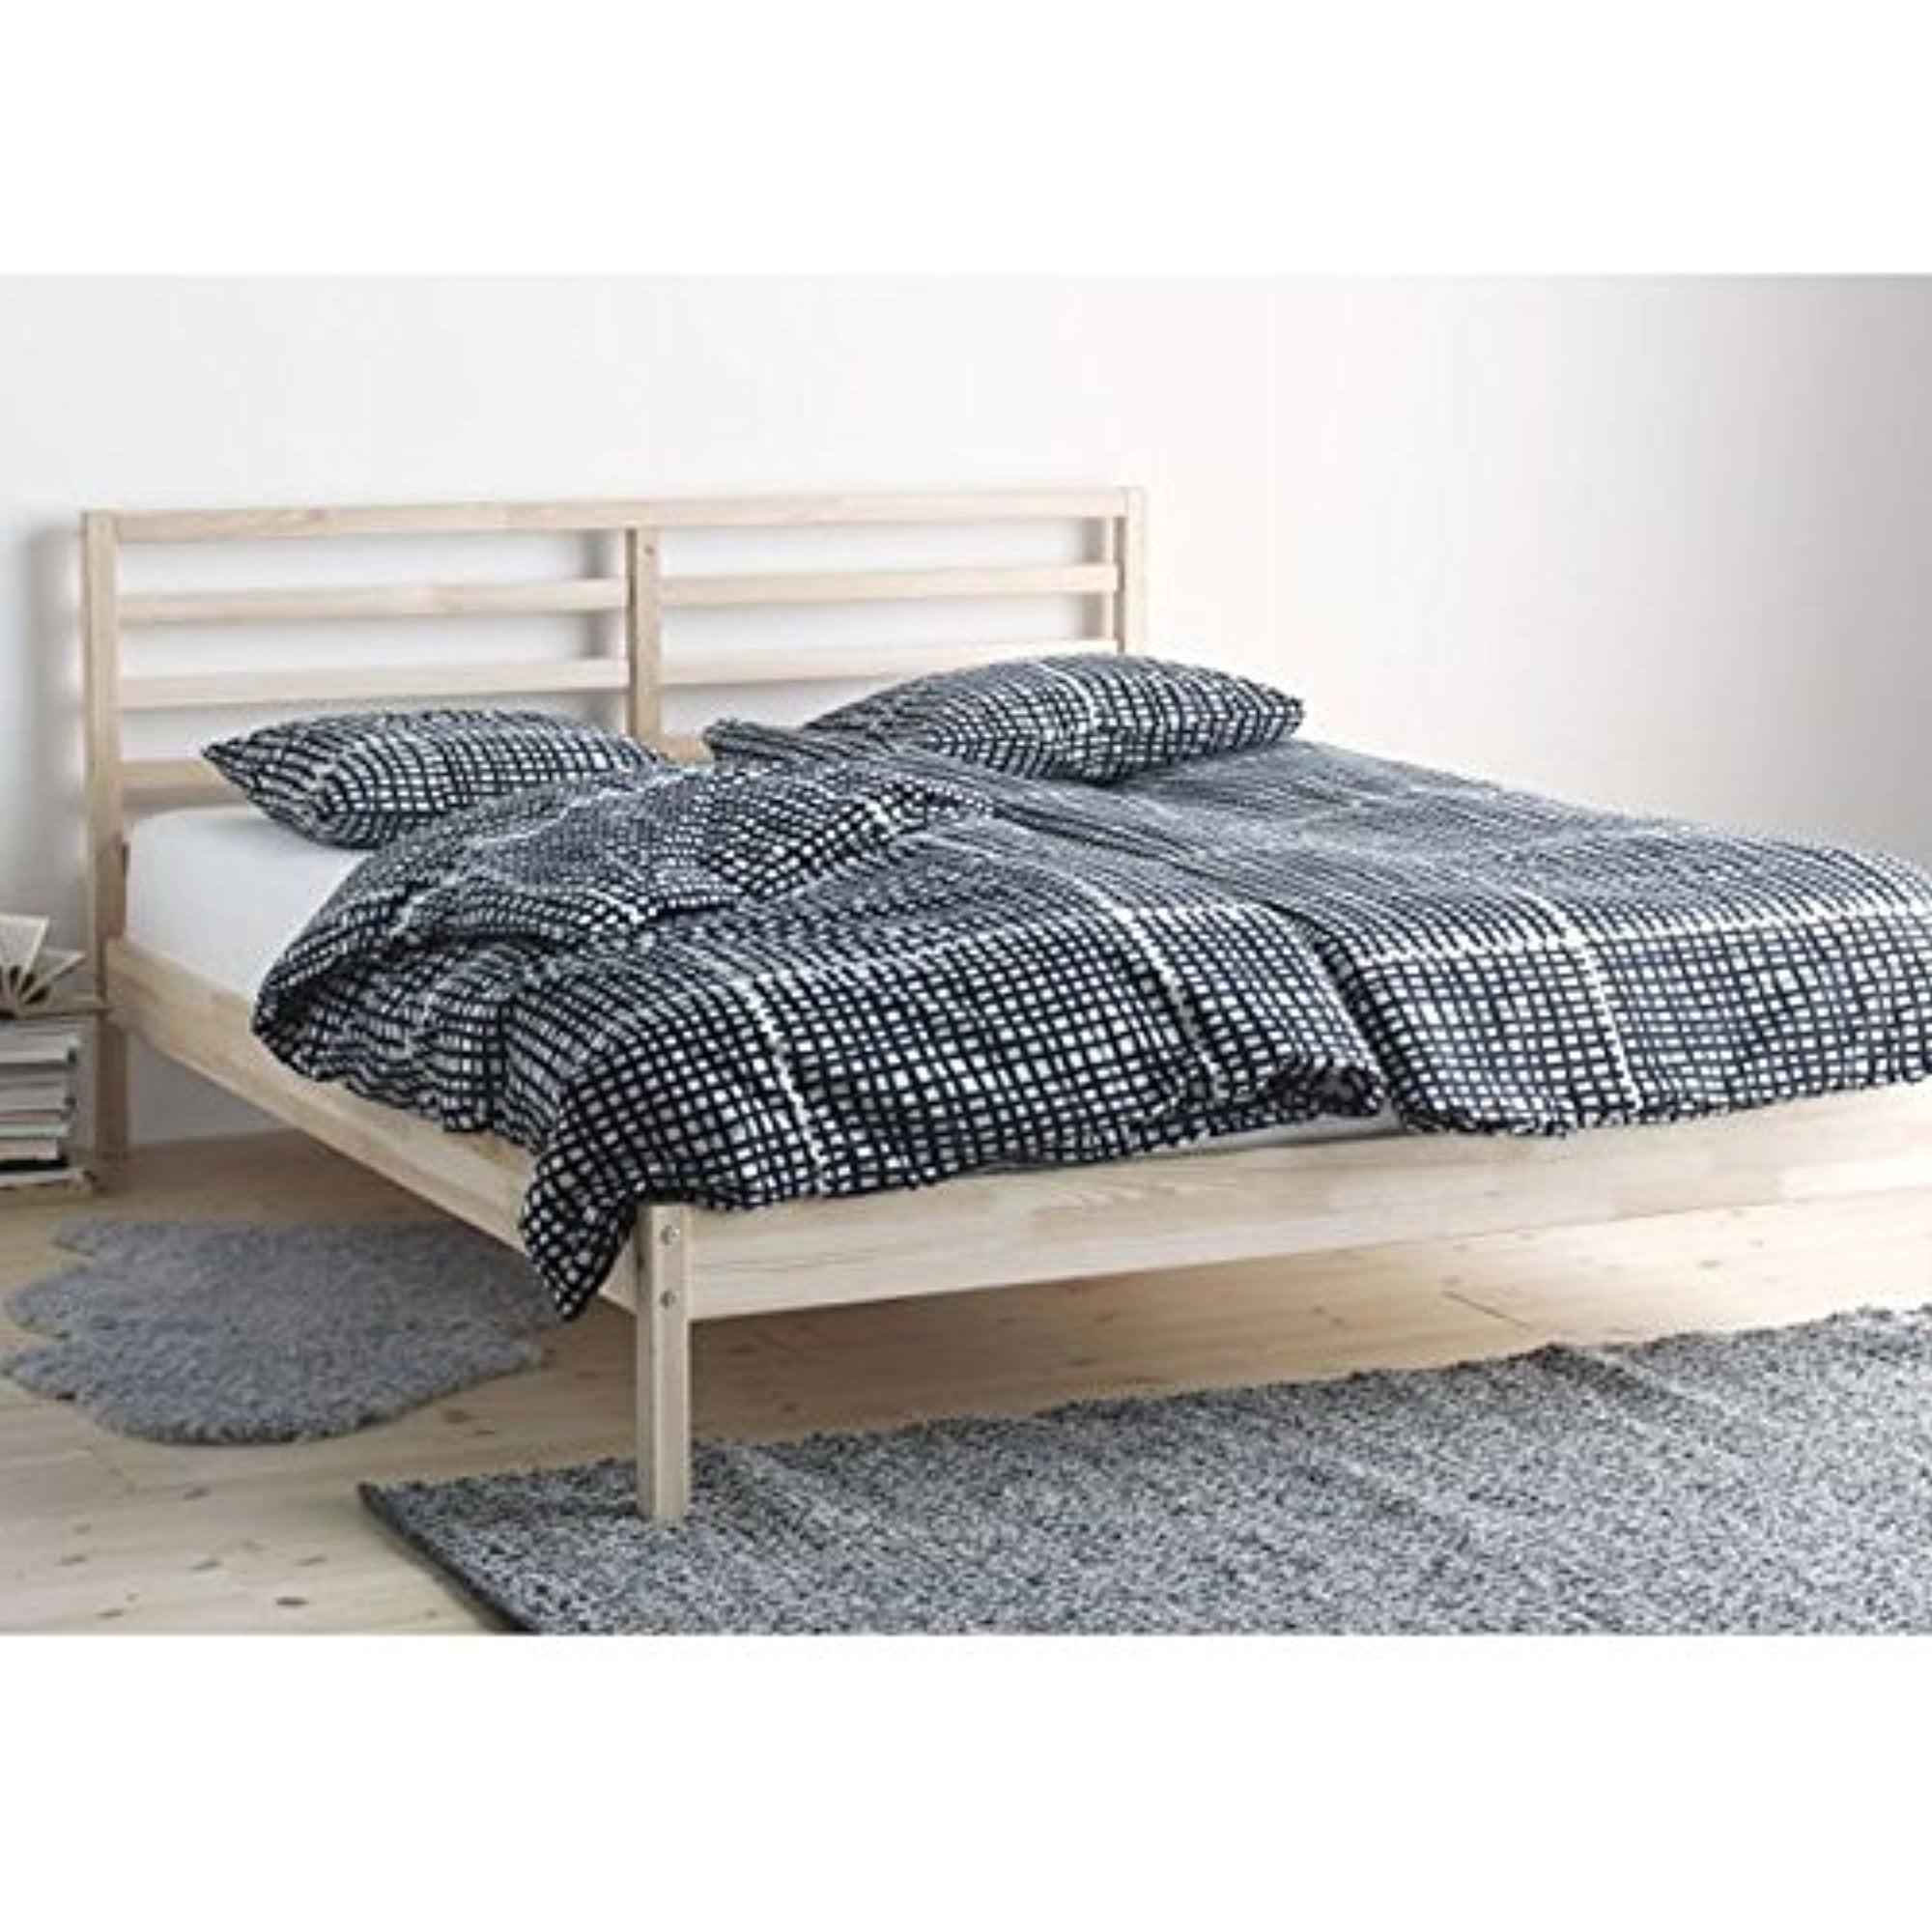 Ikea Tarva Queen Size Bed Frame Solid Pine Wood Brown 103838.1122.2016